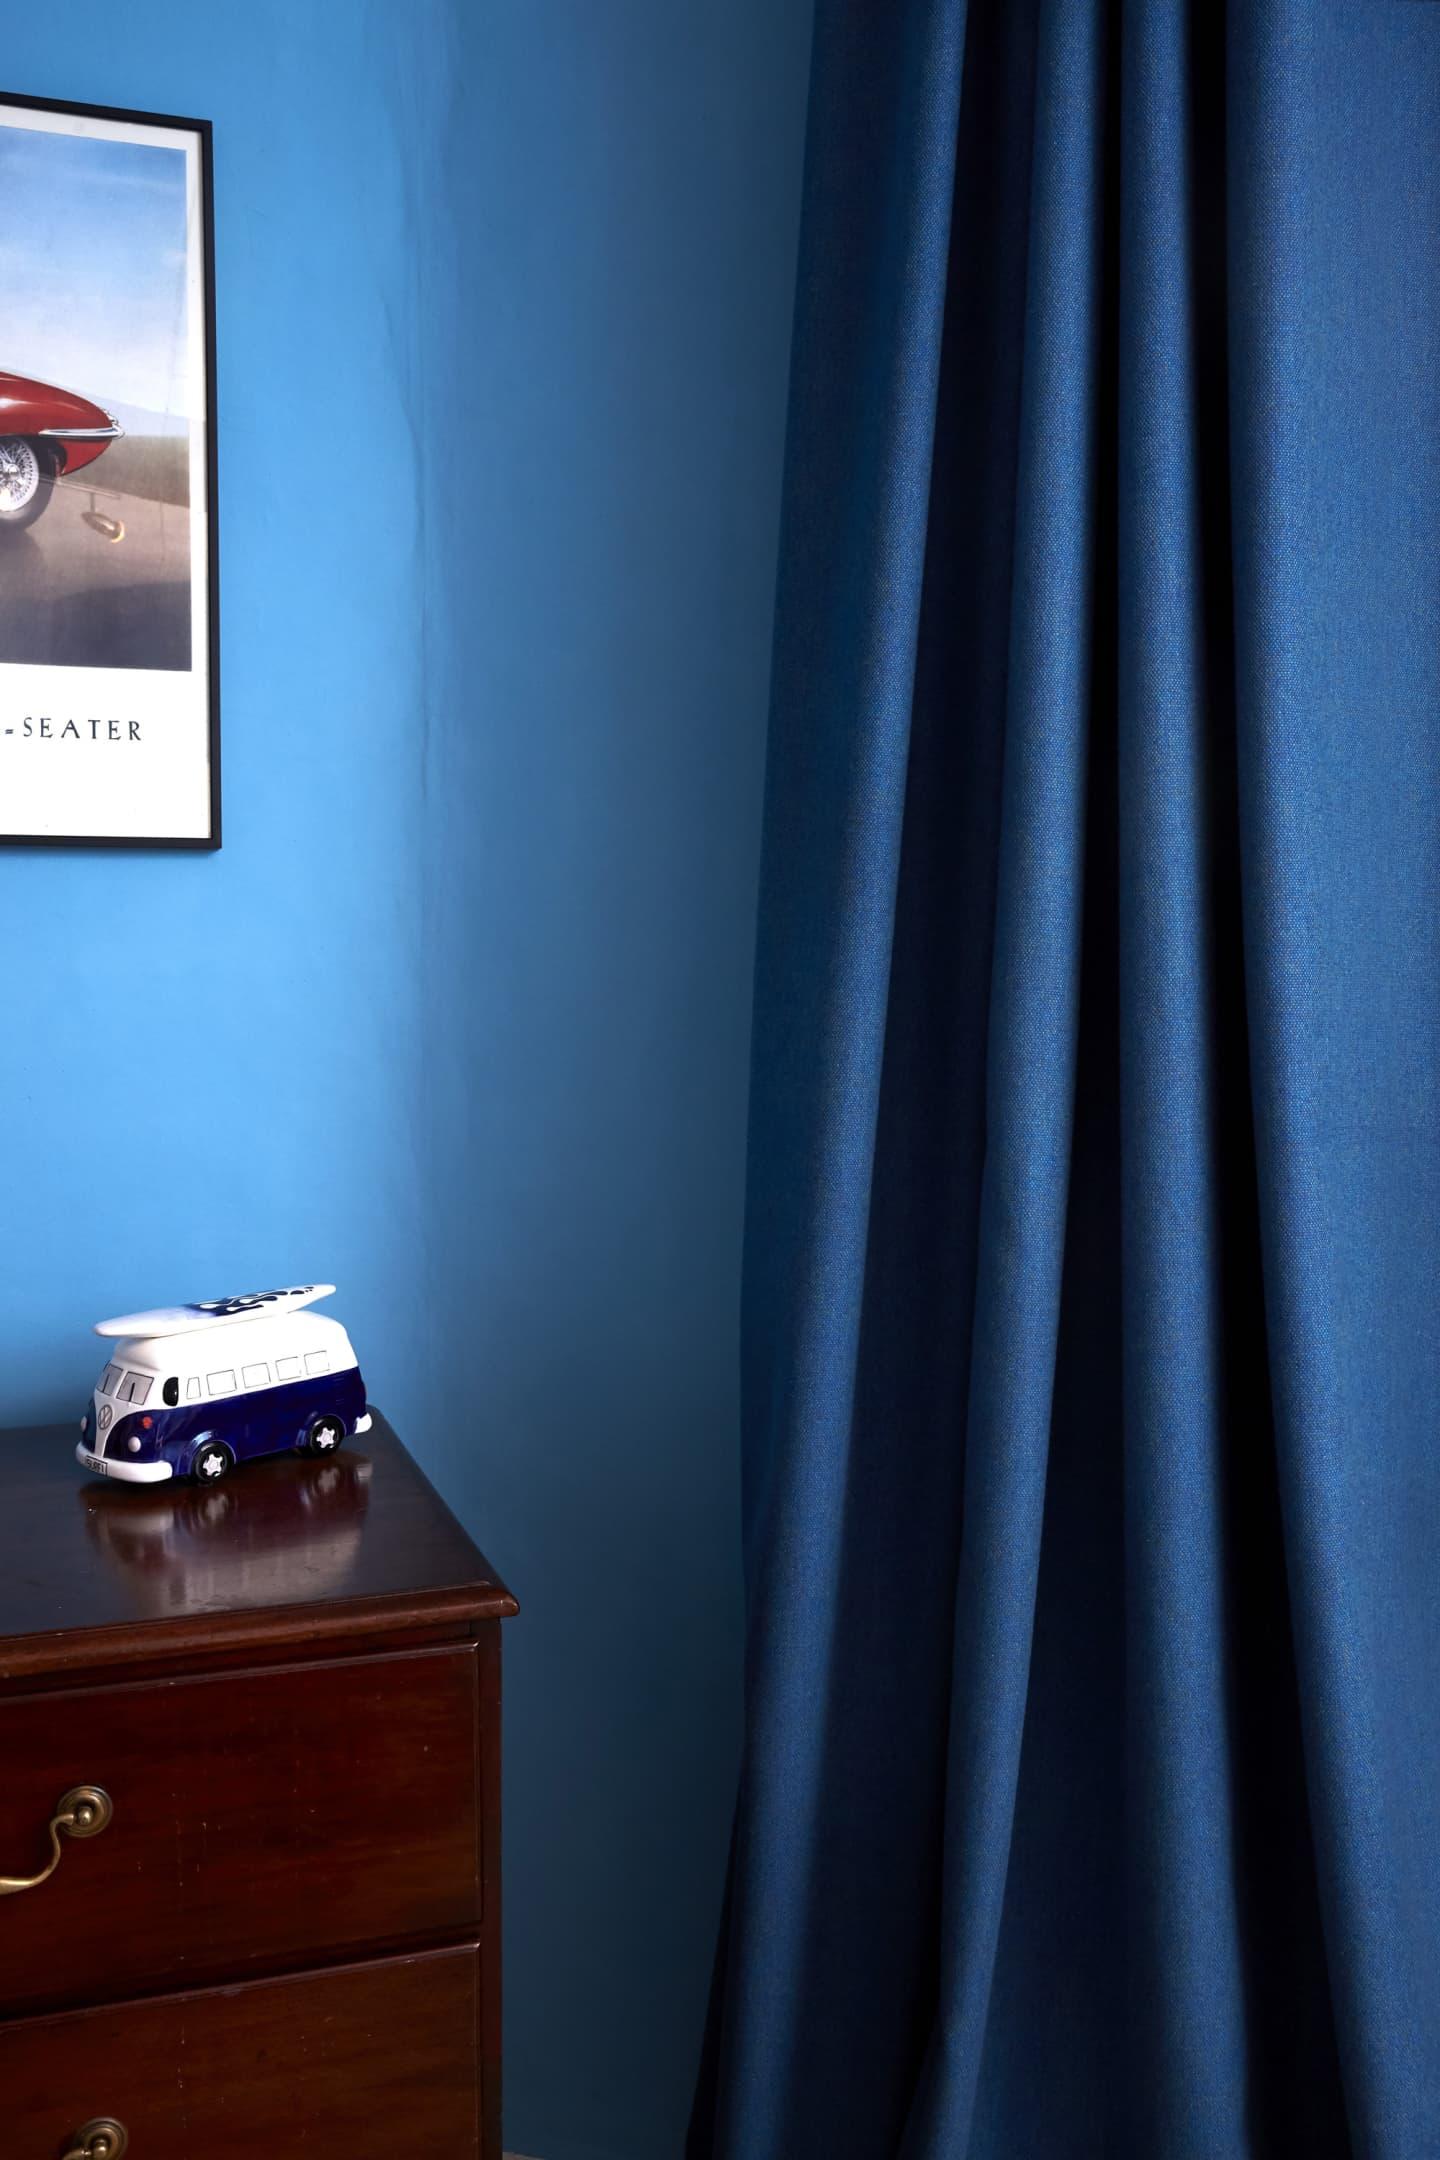 Navy blue curtain and dark wooden draws